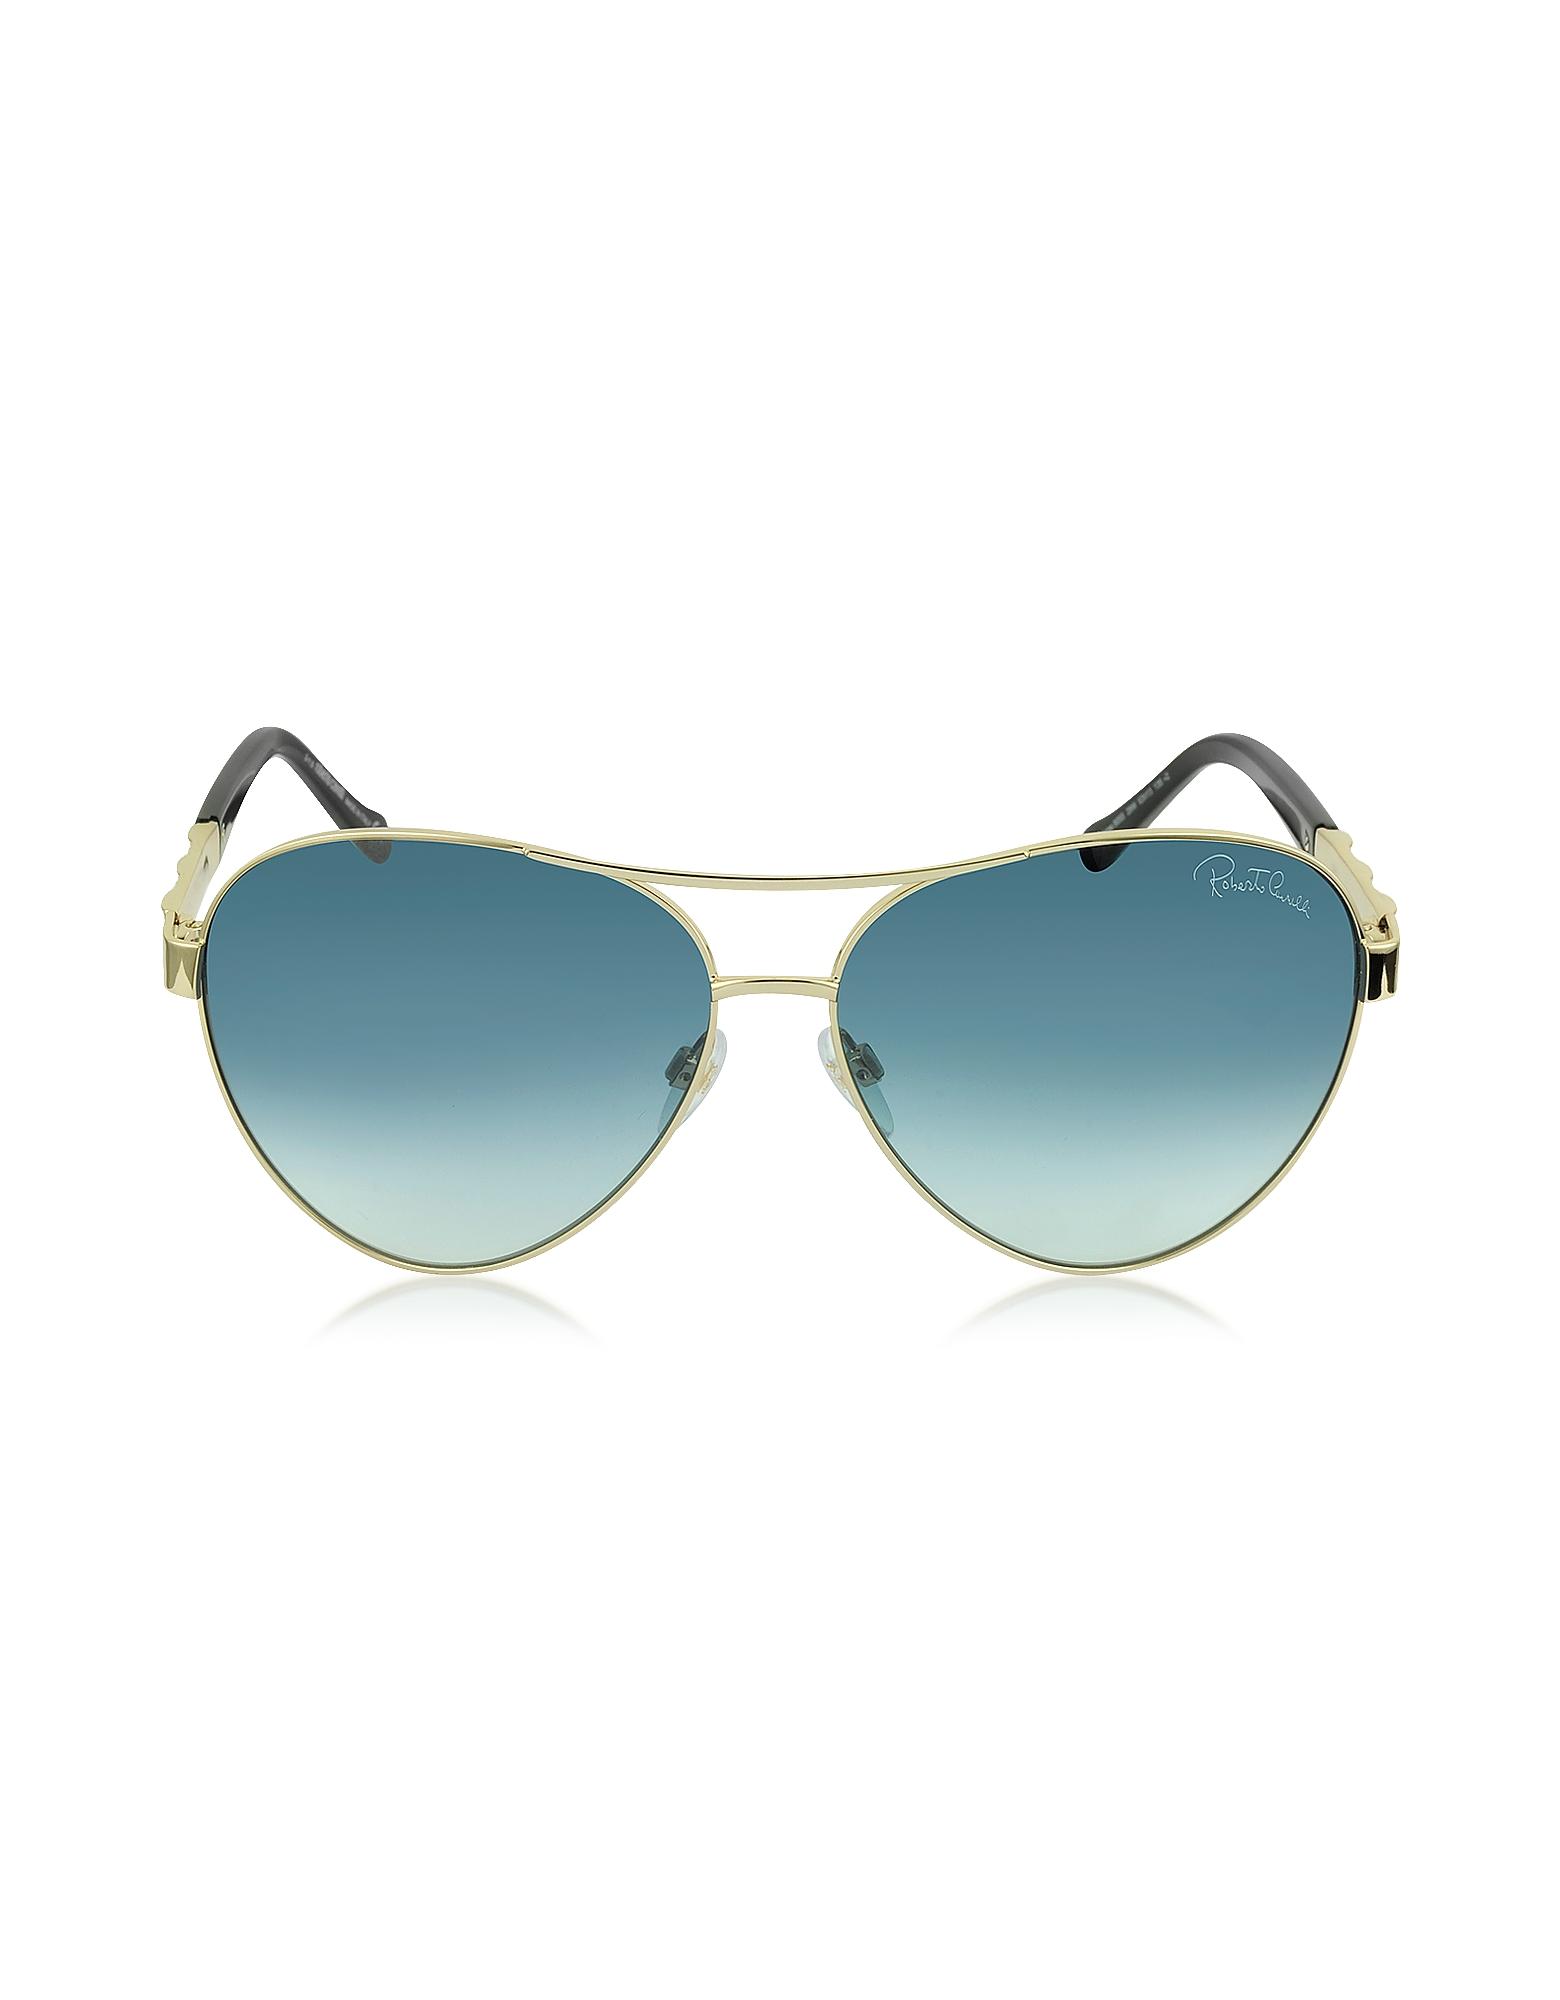 Roberto Cavalli Sunglasses, Merga 905S Gold Metal Aviator Sunglasses w/Crystals